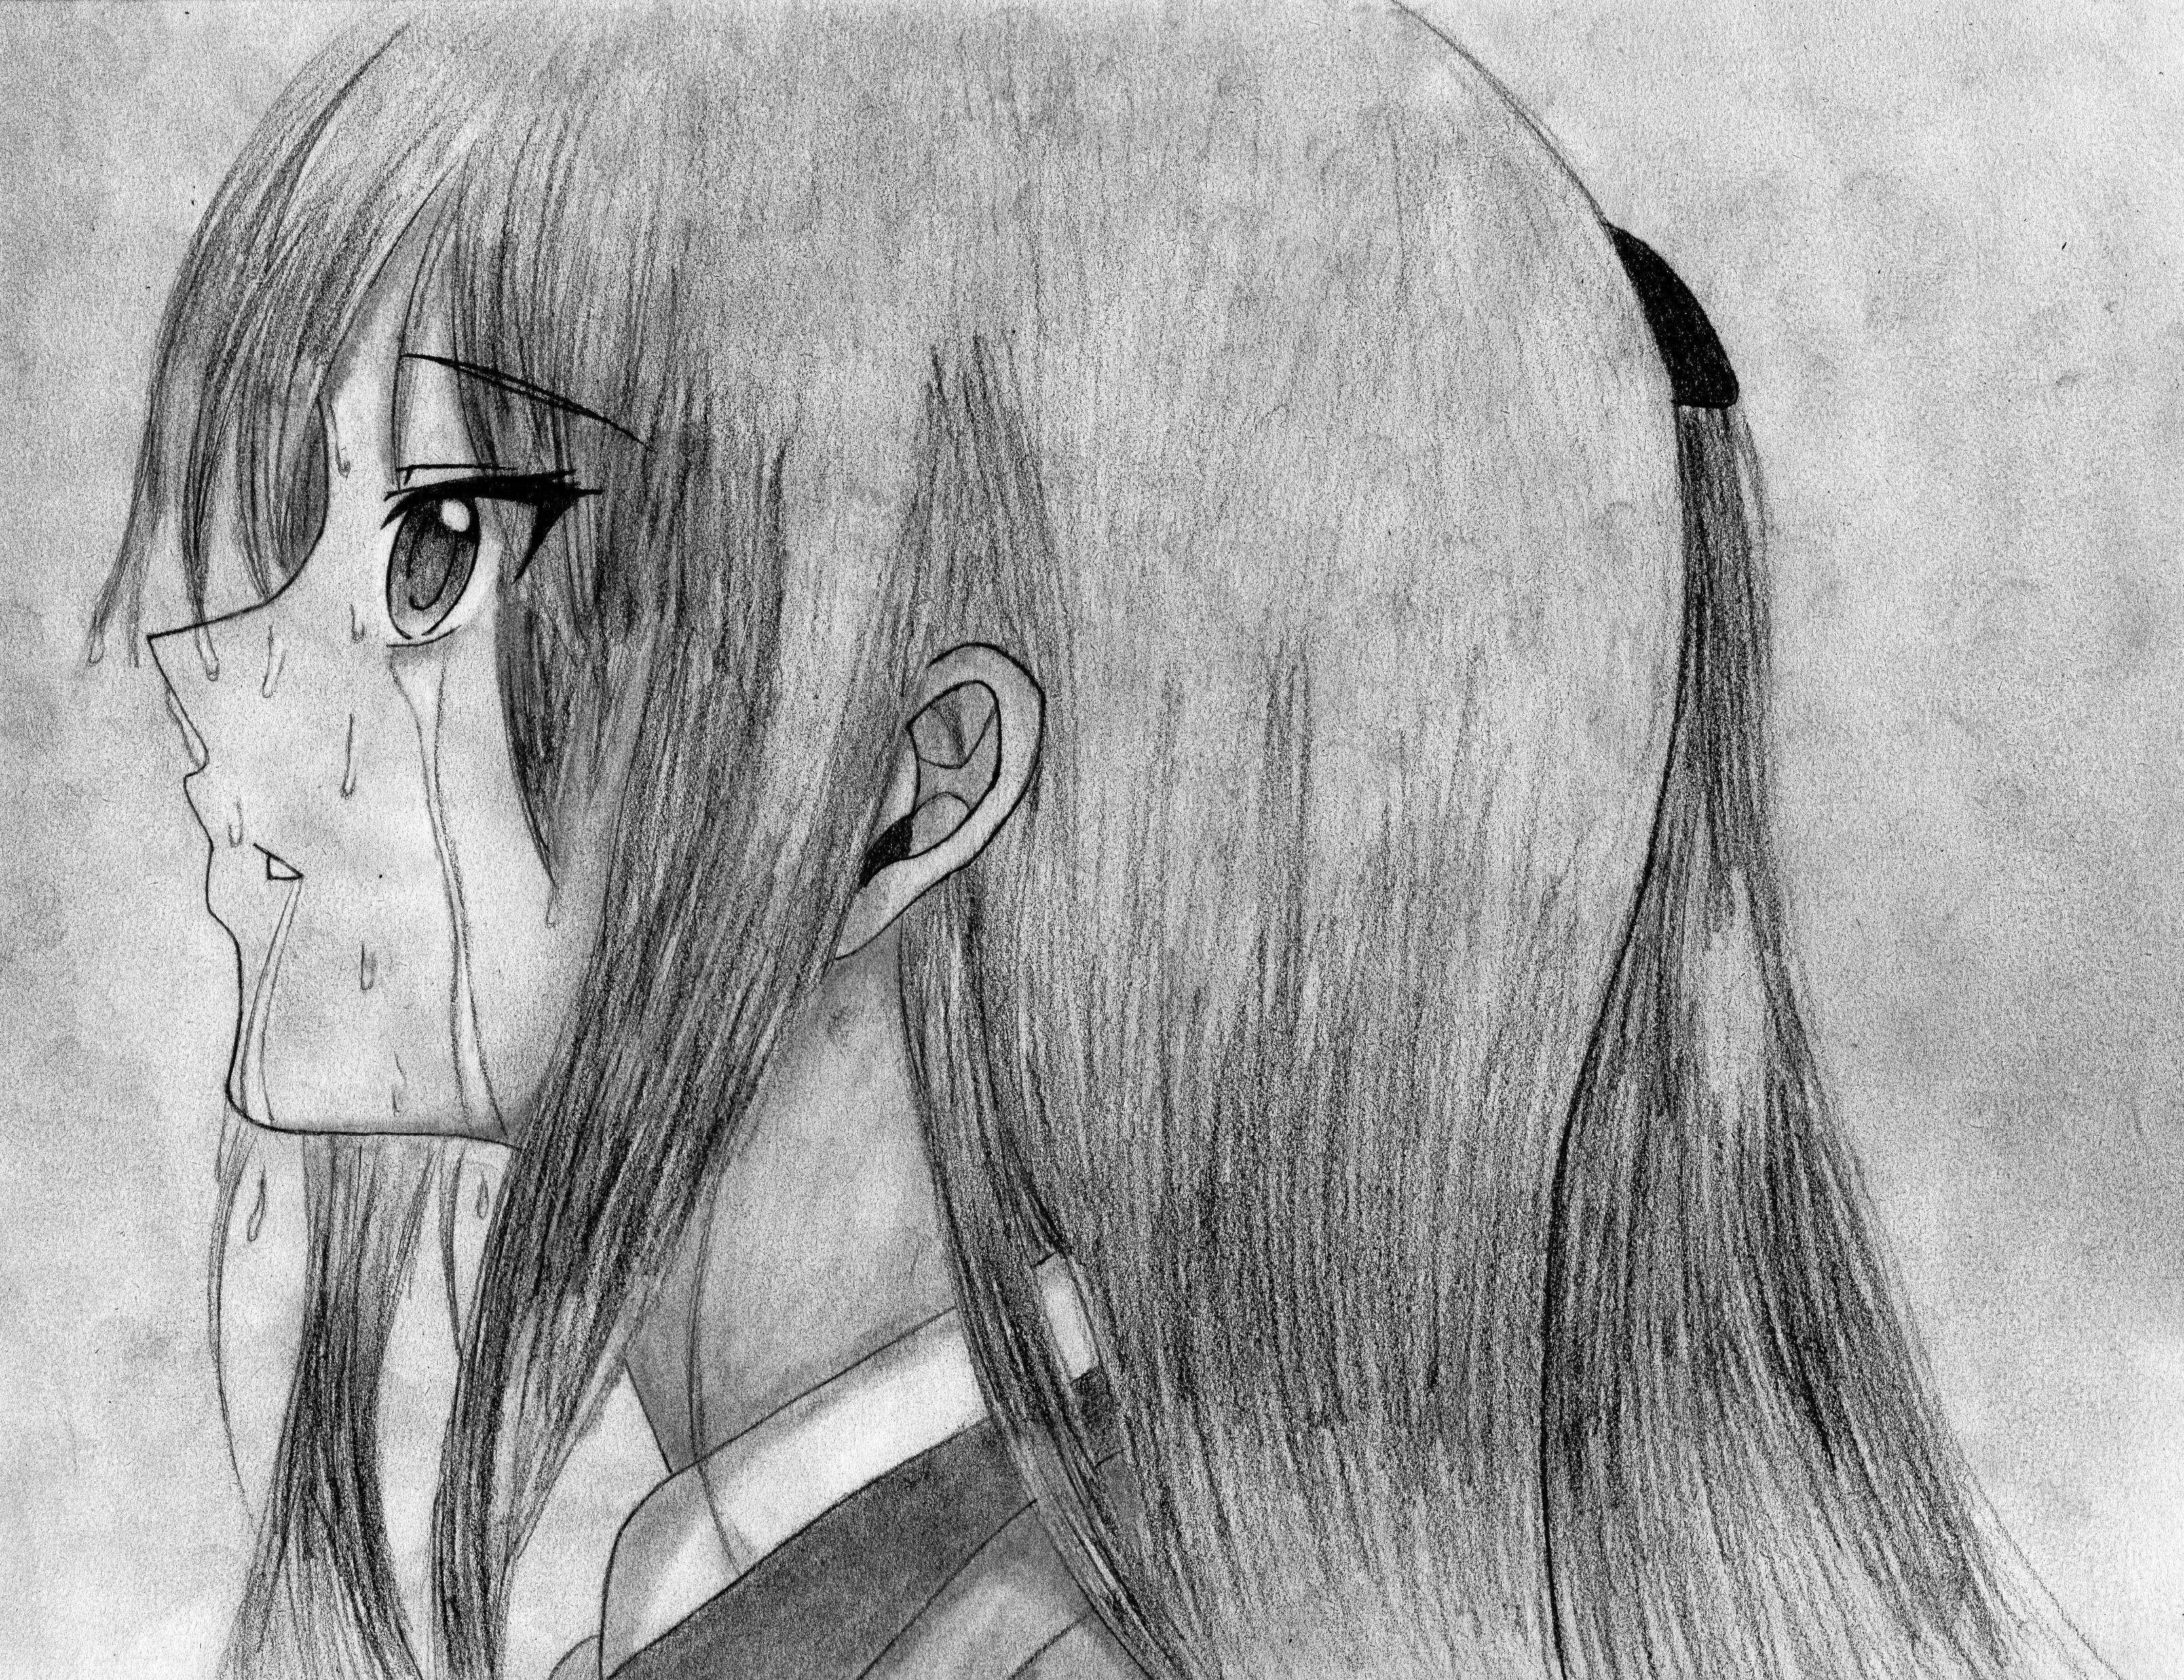 Crying in the Rain by OtakuTiki on DeviantArt